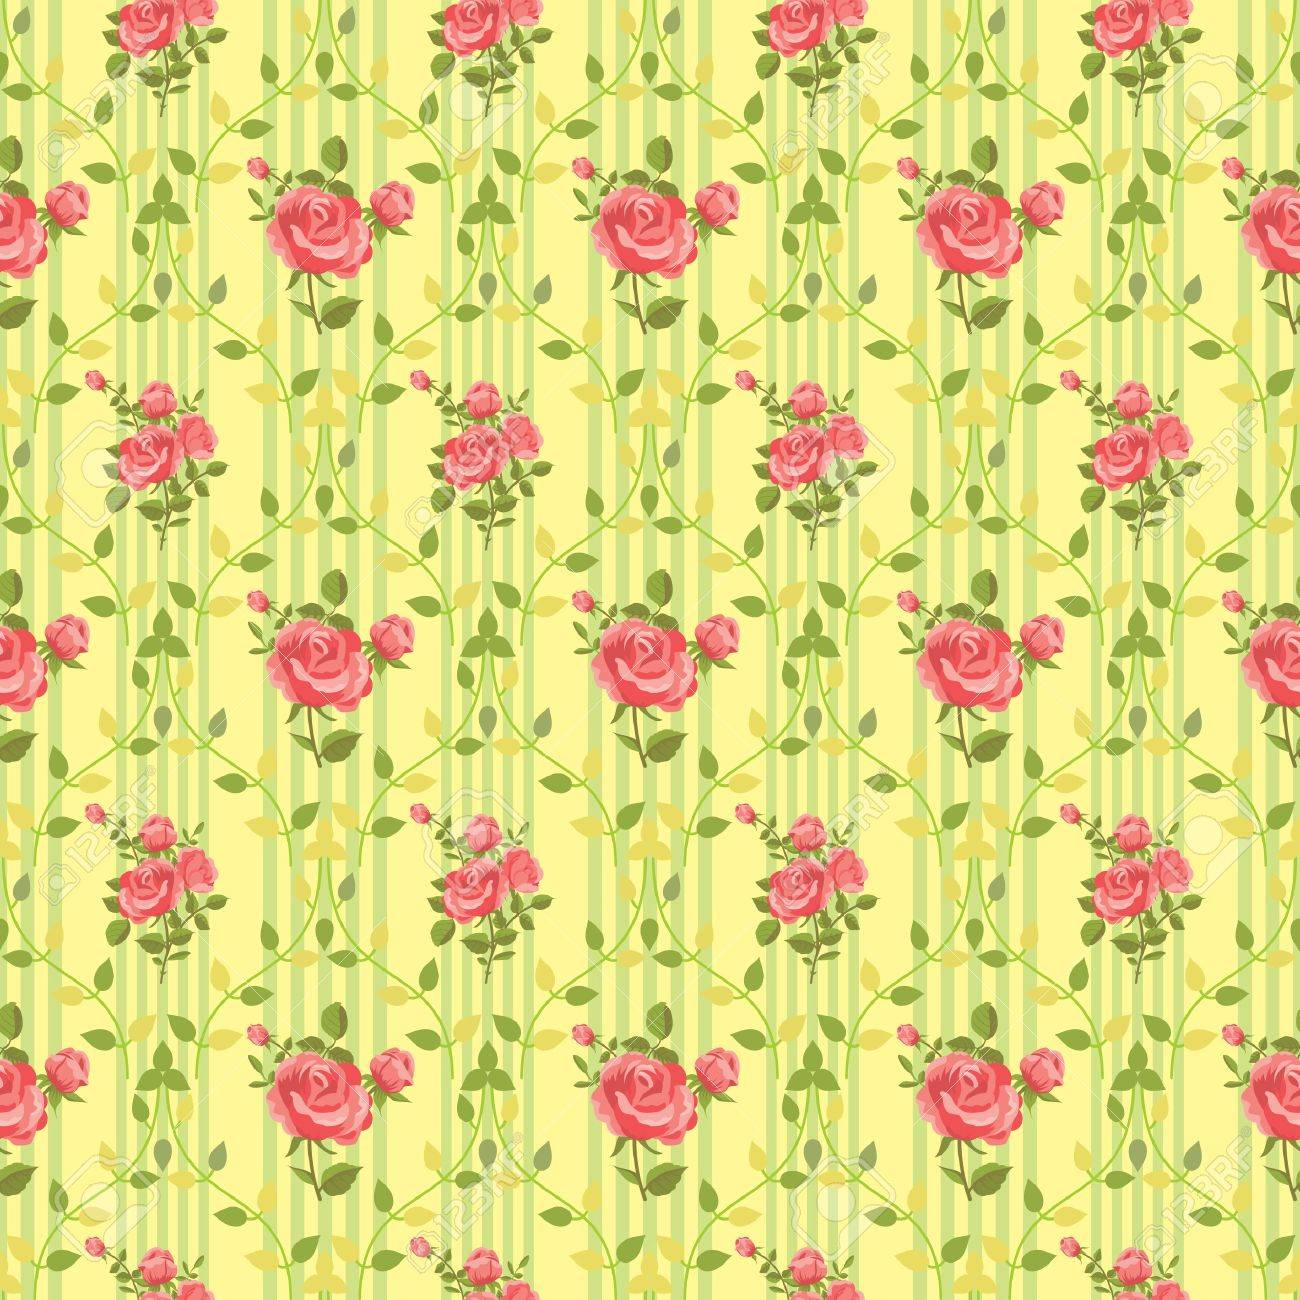 Blooming Rose Vintage Wallpaper Stock Vector